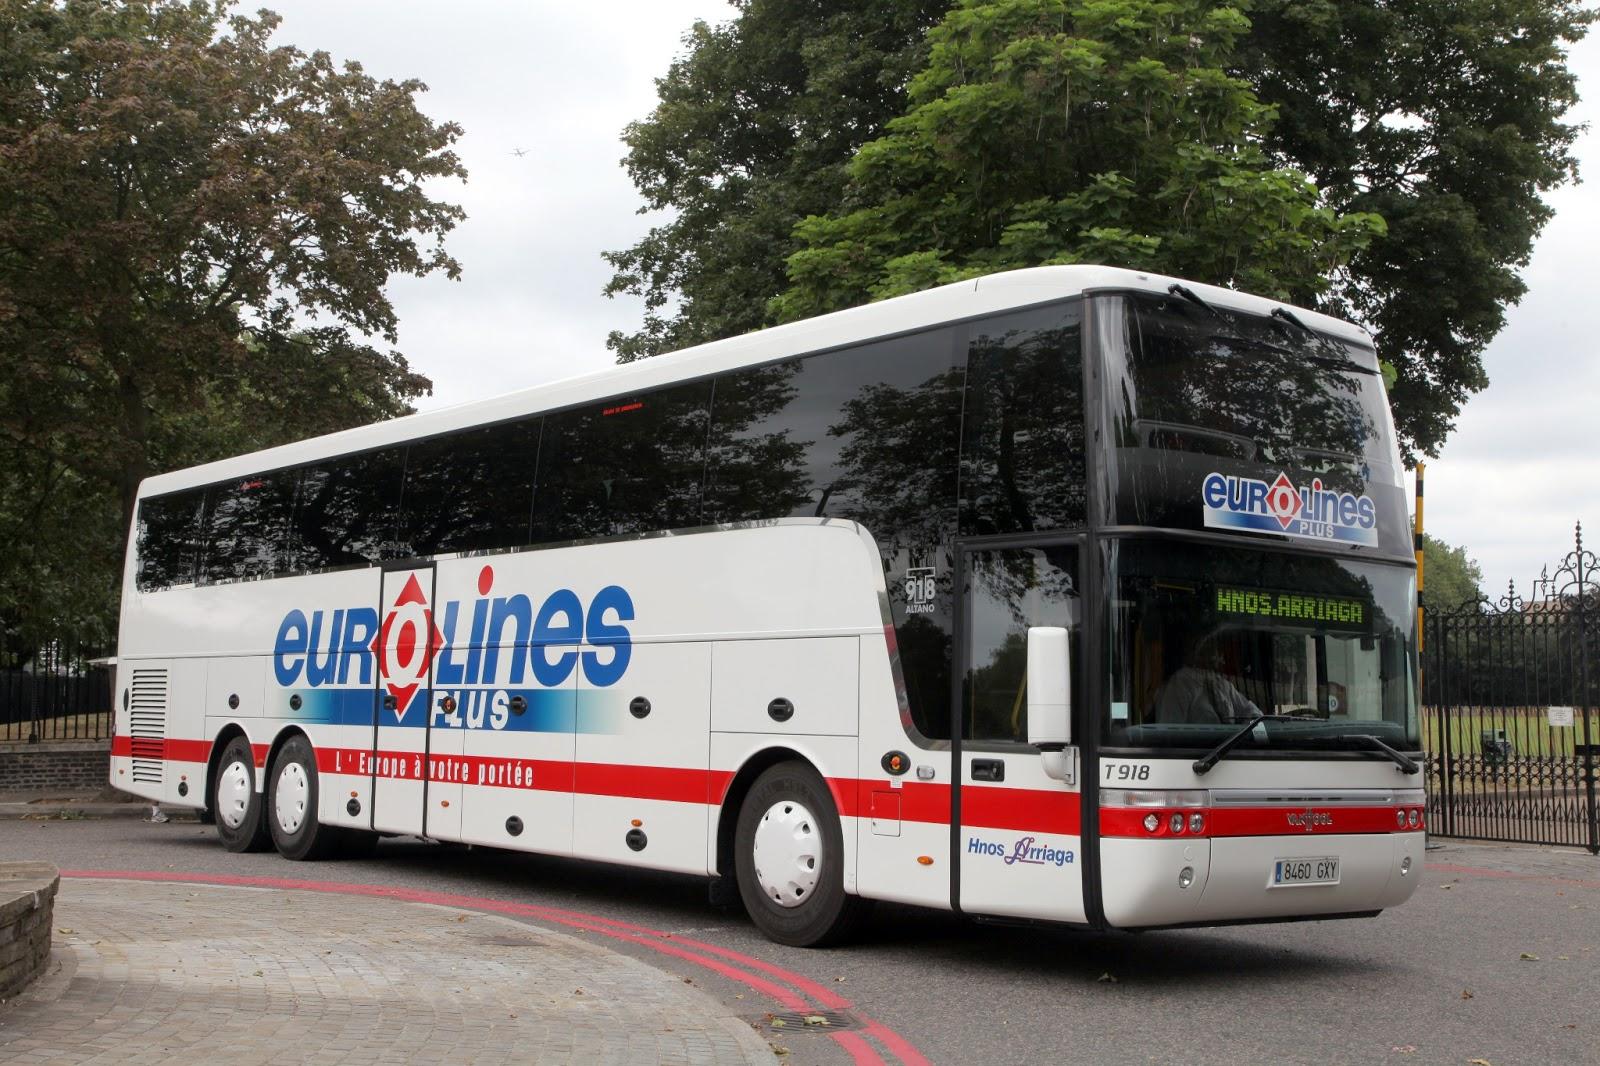 A eurolines coach